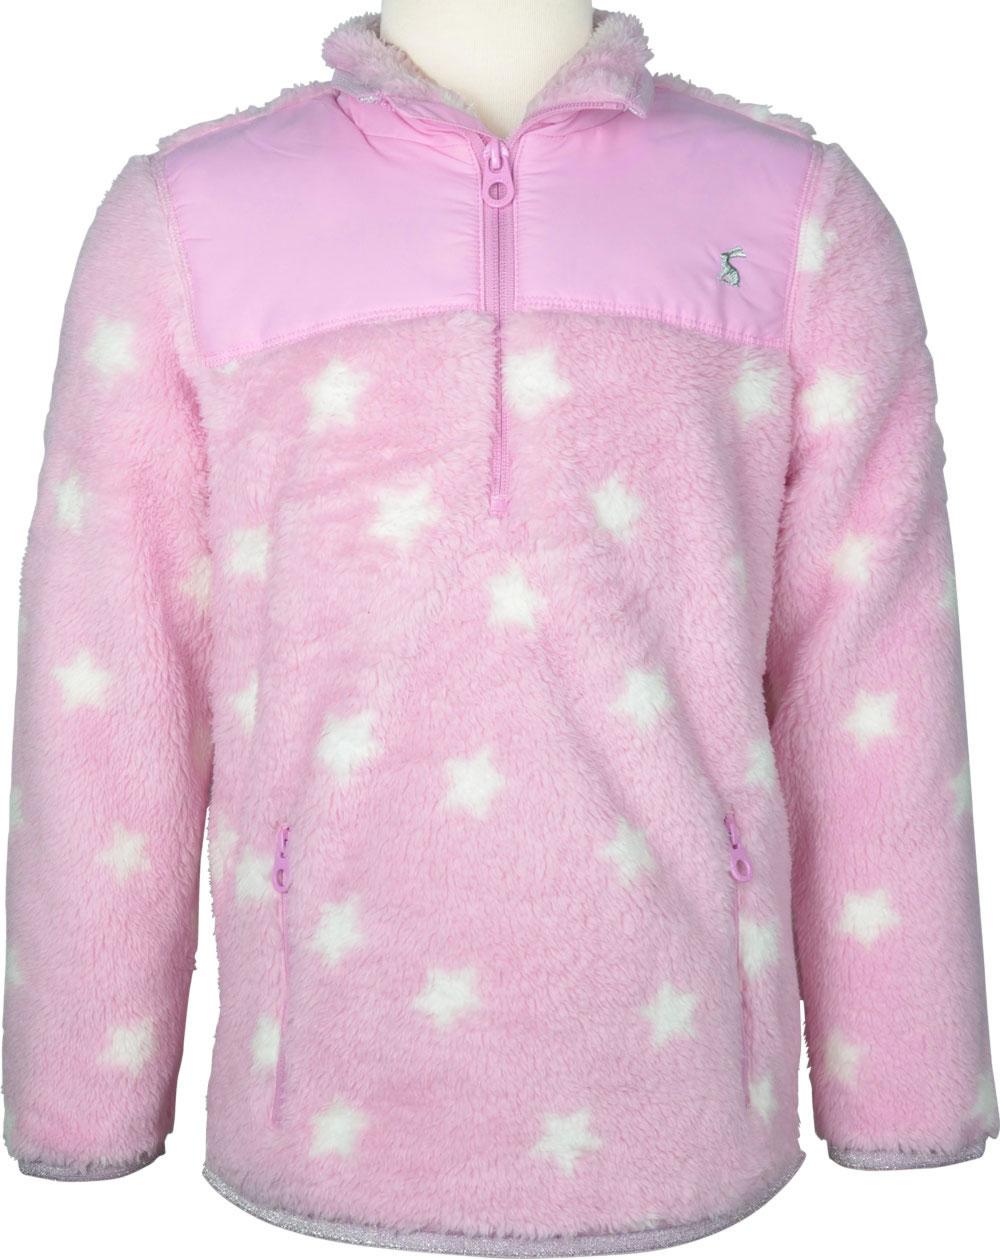 Tom Joule Teddyplüsch Pullover m. Zipper STERNE pink Z_ODRELENA PNKSTAR